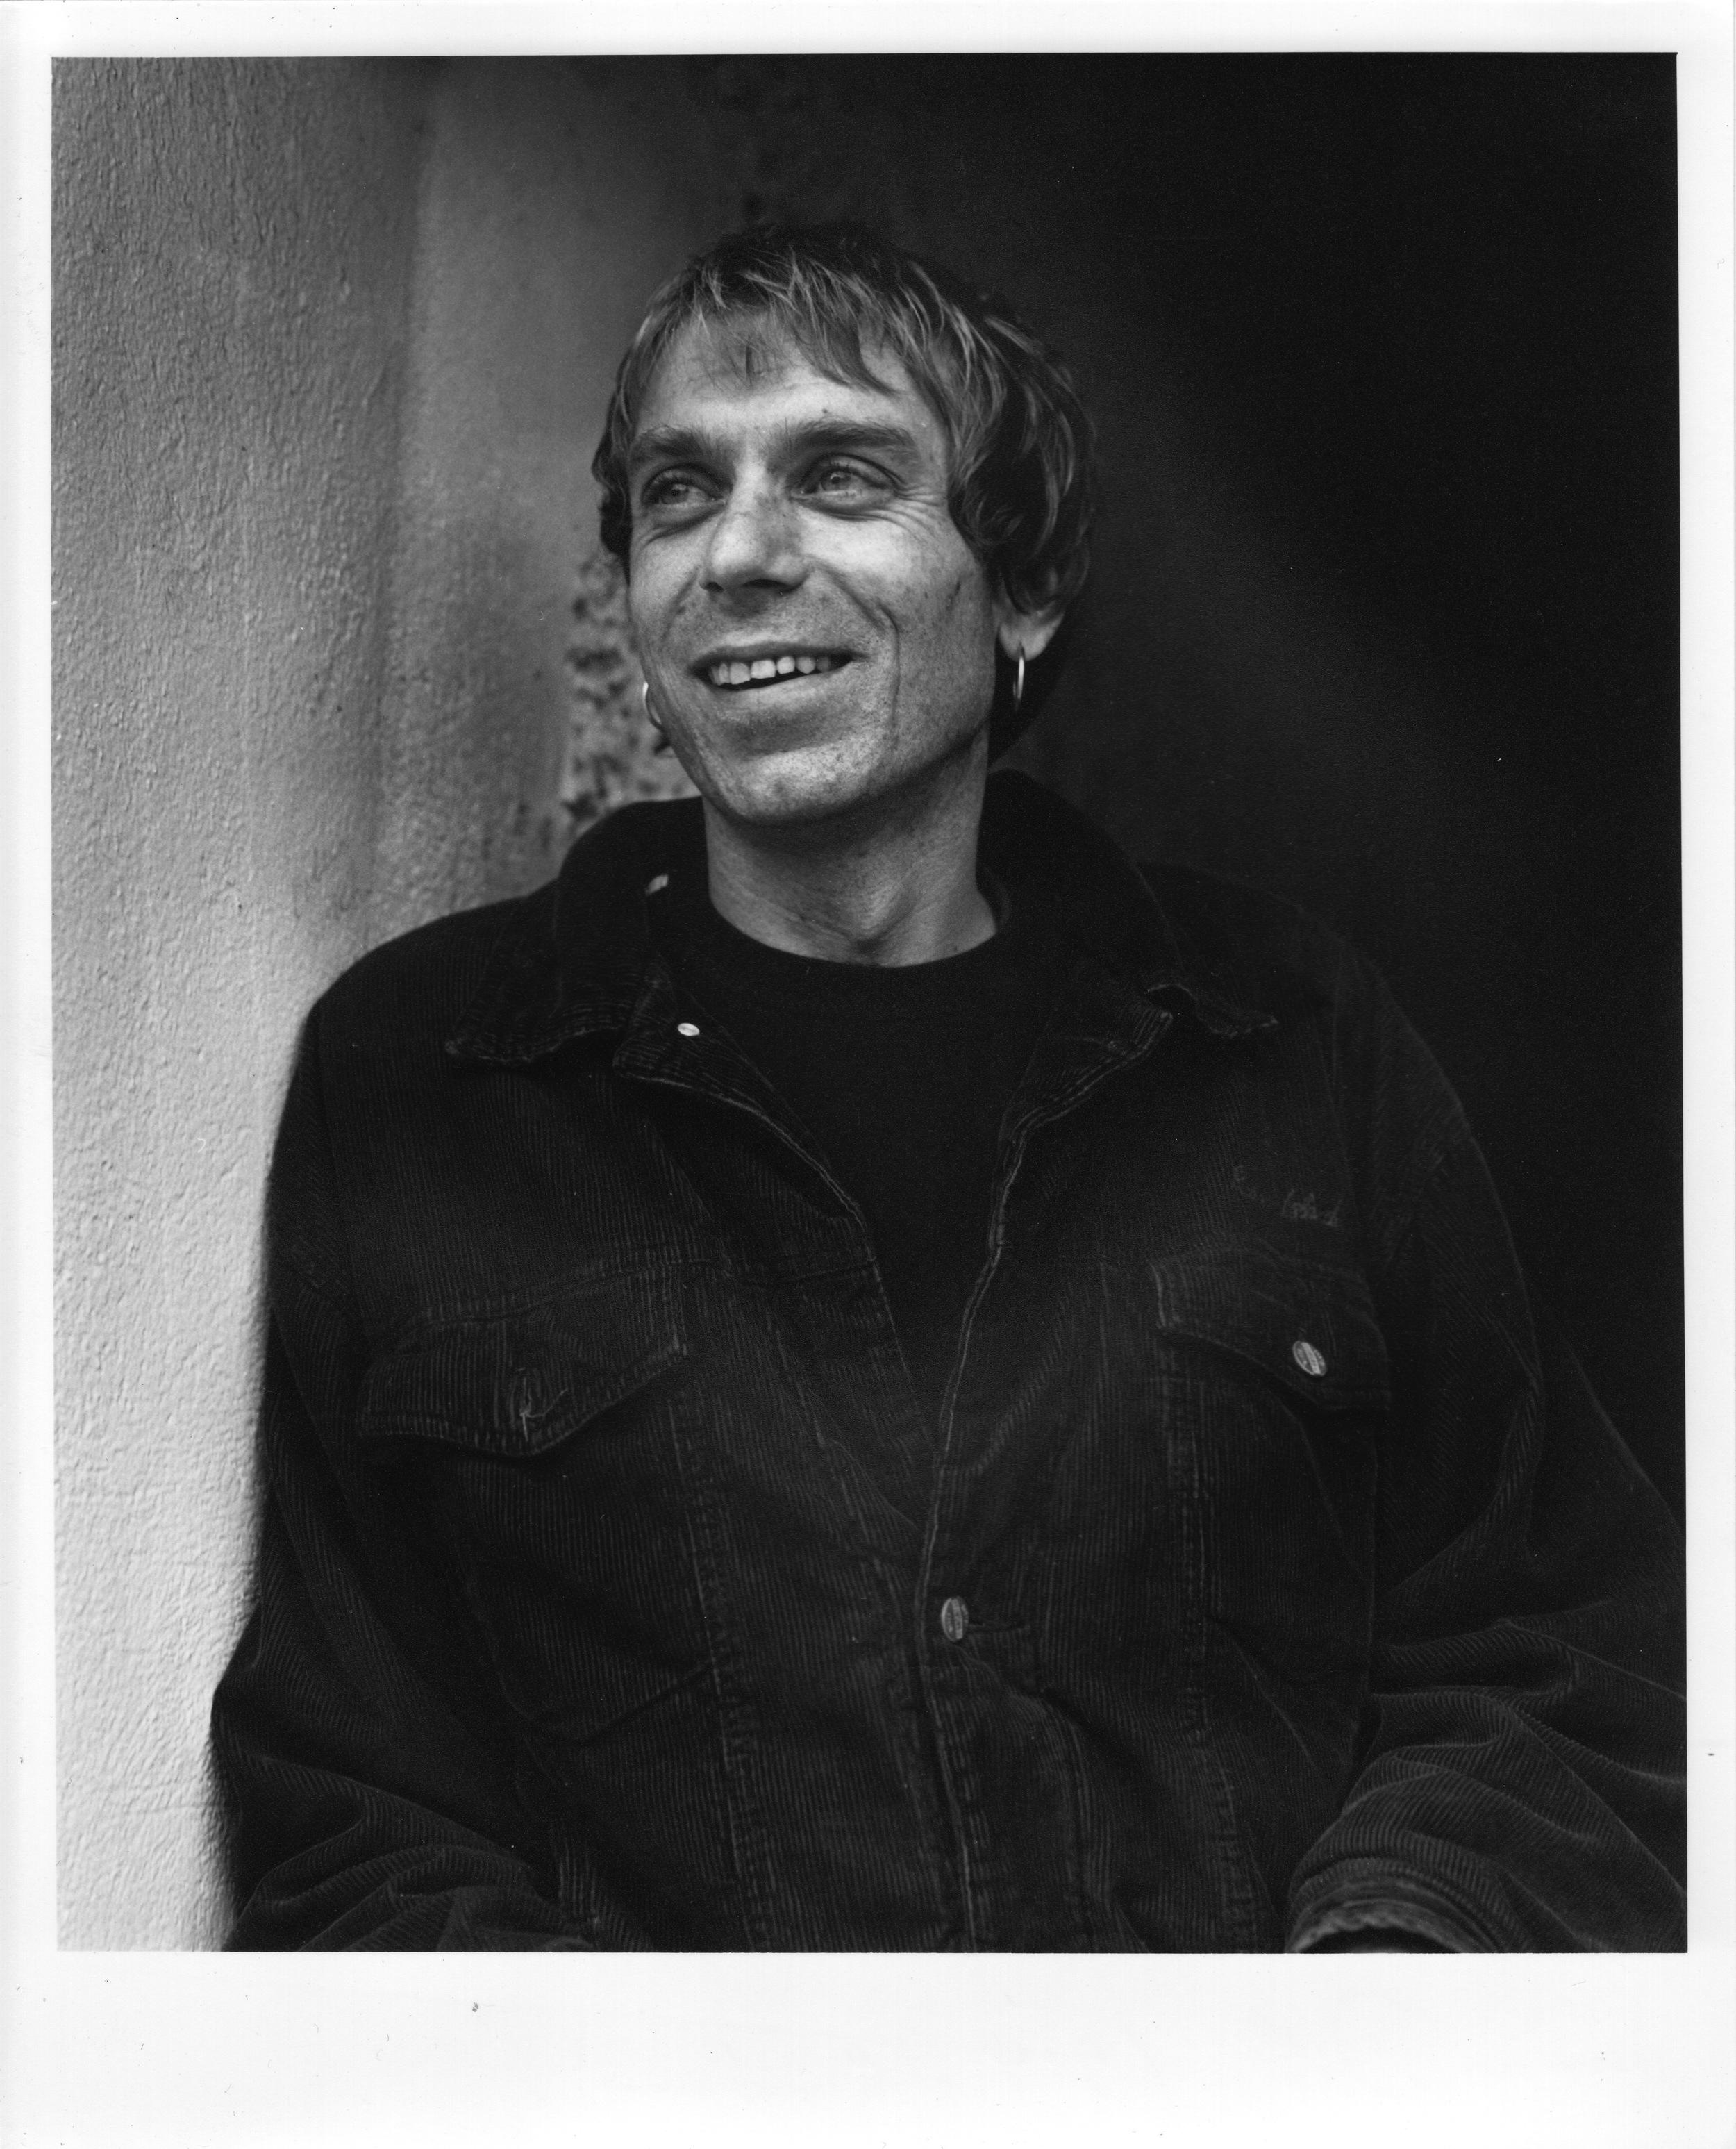 Simon DK, 1995(photo by Martin Healy)